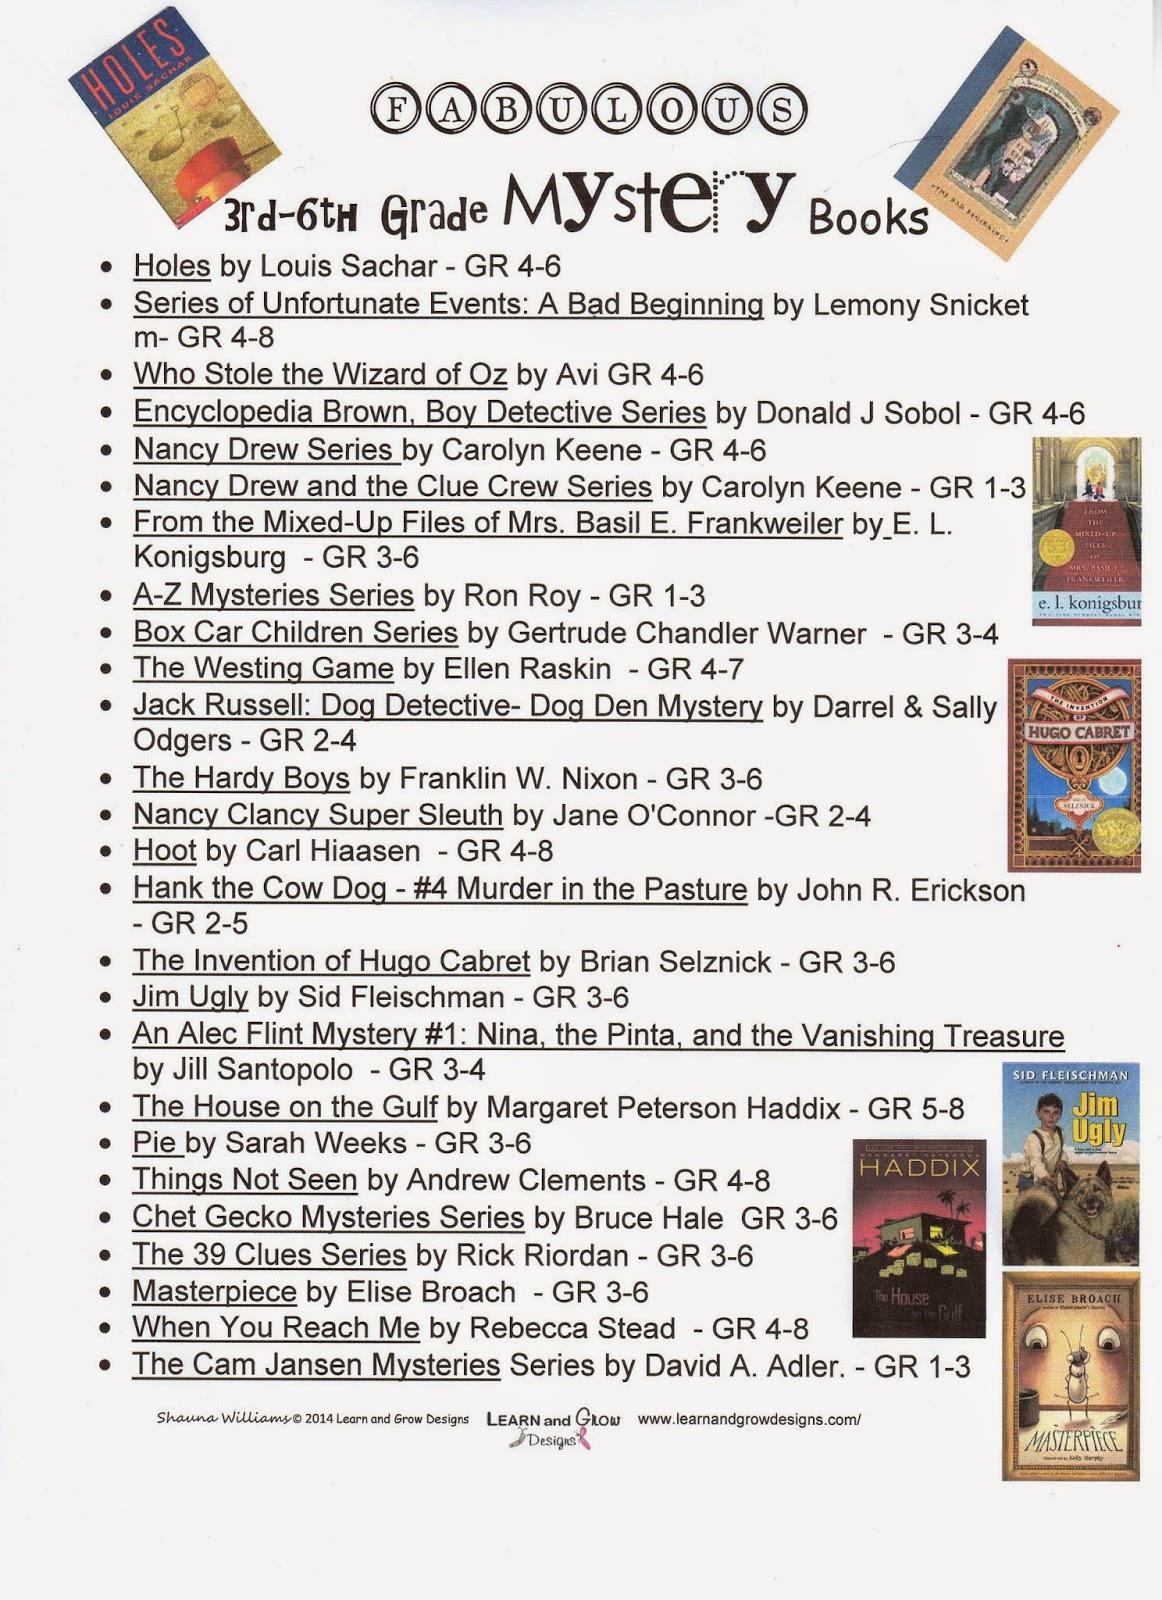 List of Boxcar Children novels